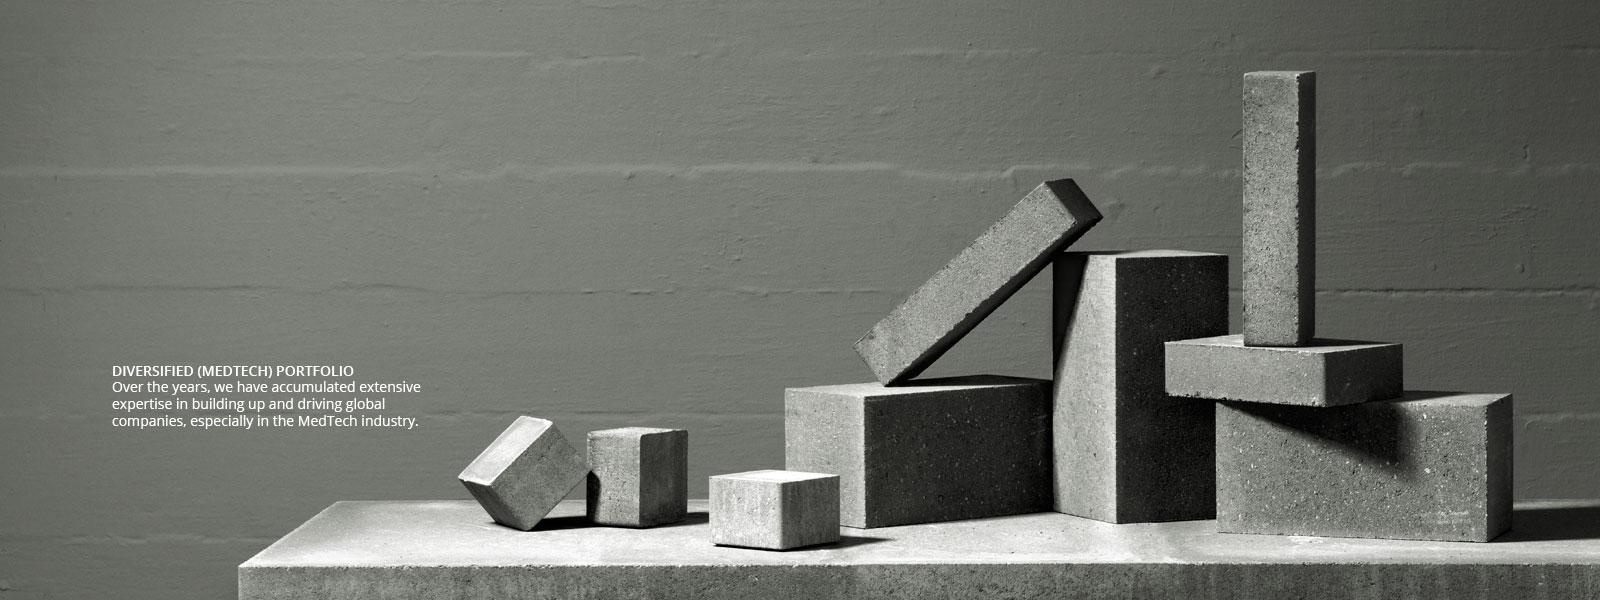 rocks-diversed-portfolio-1600x500